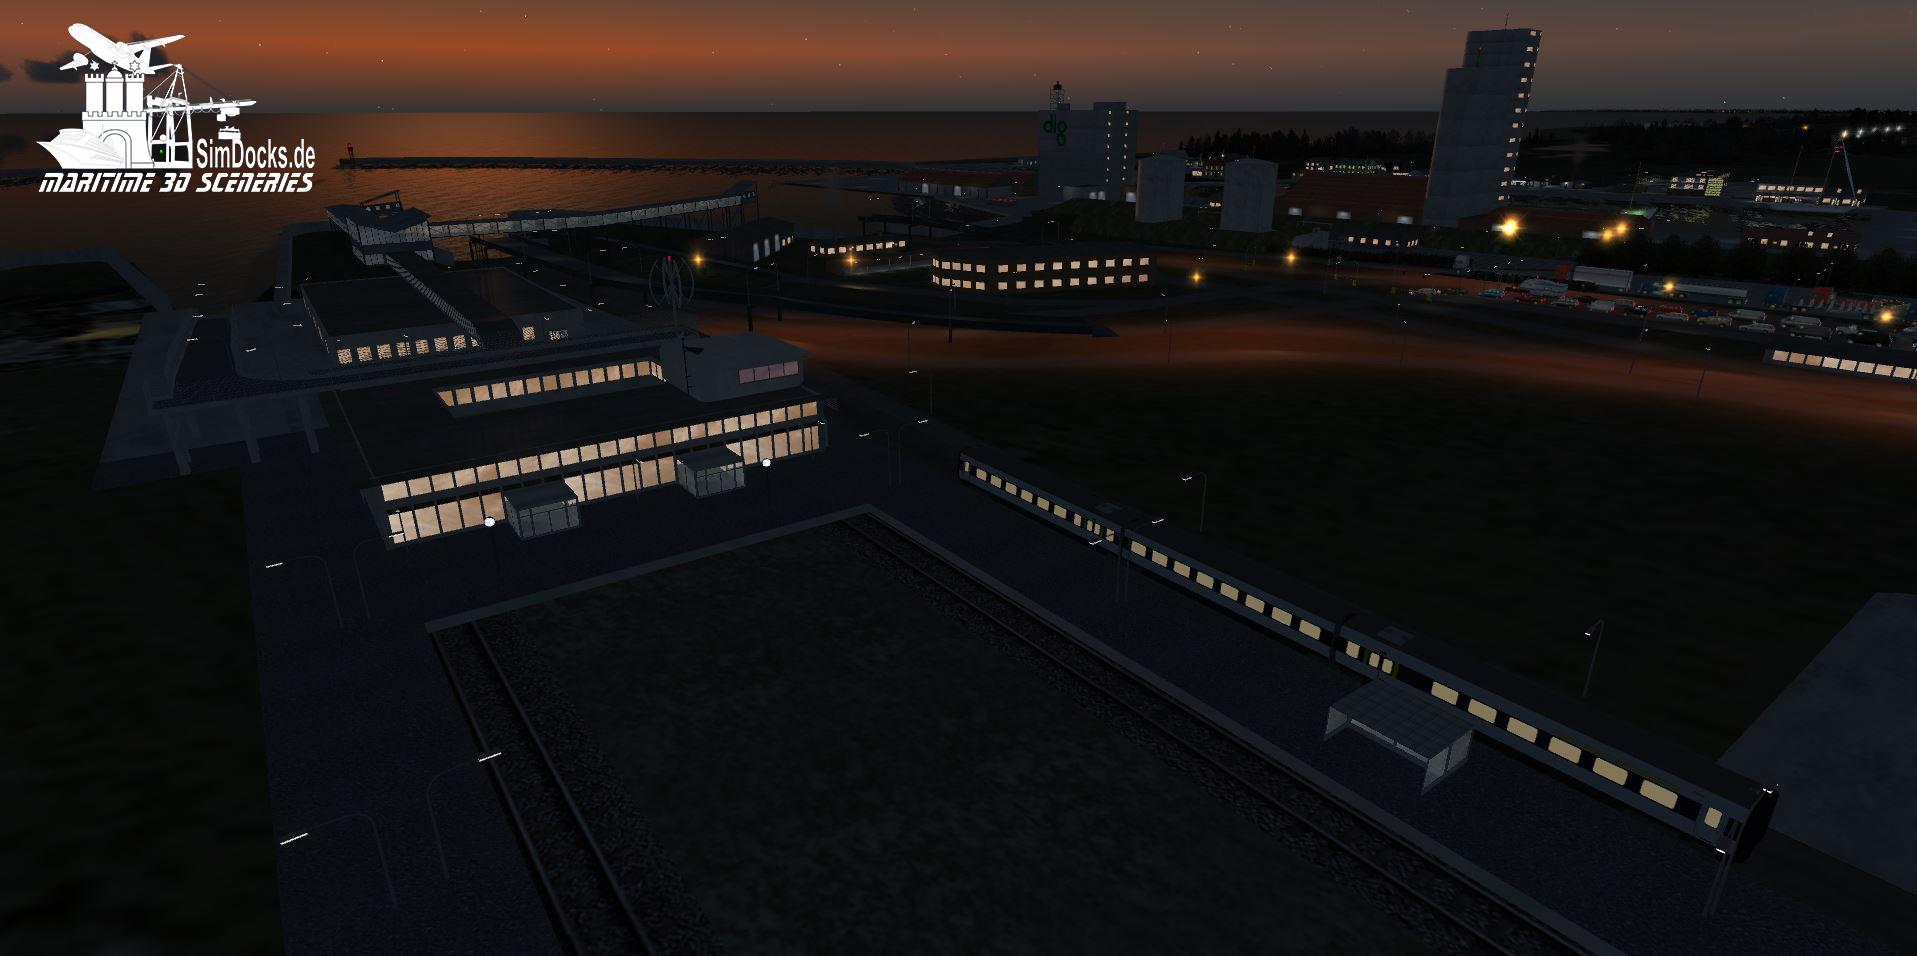 Rodbyhavn